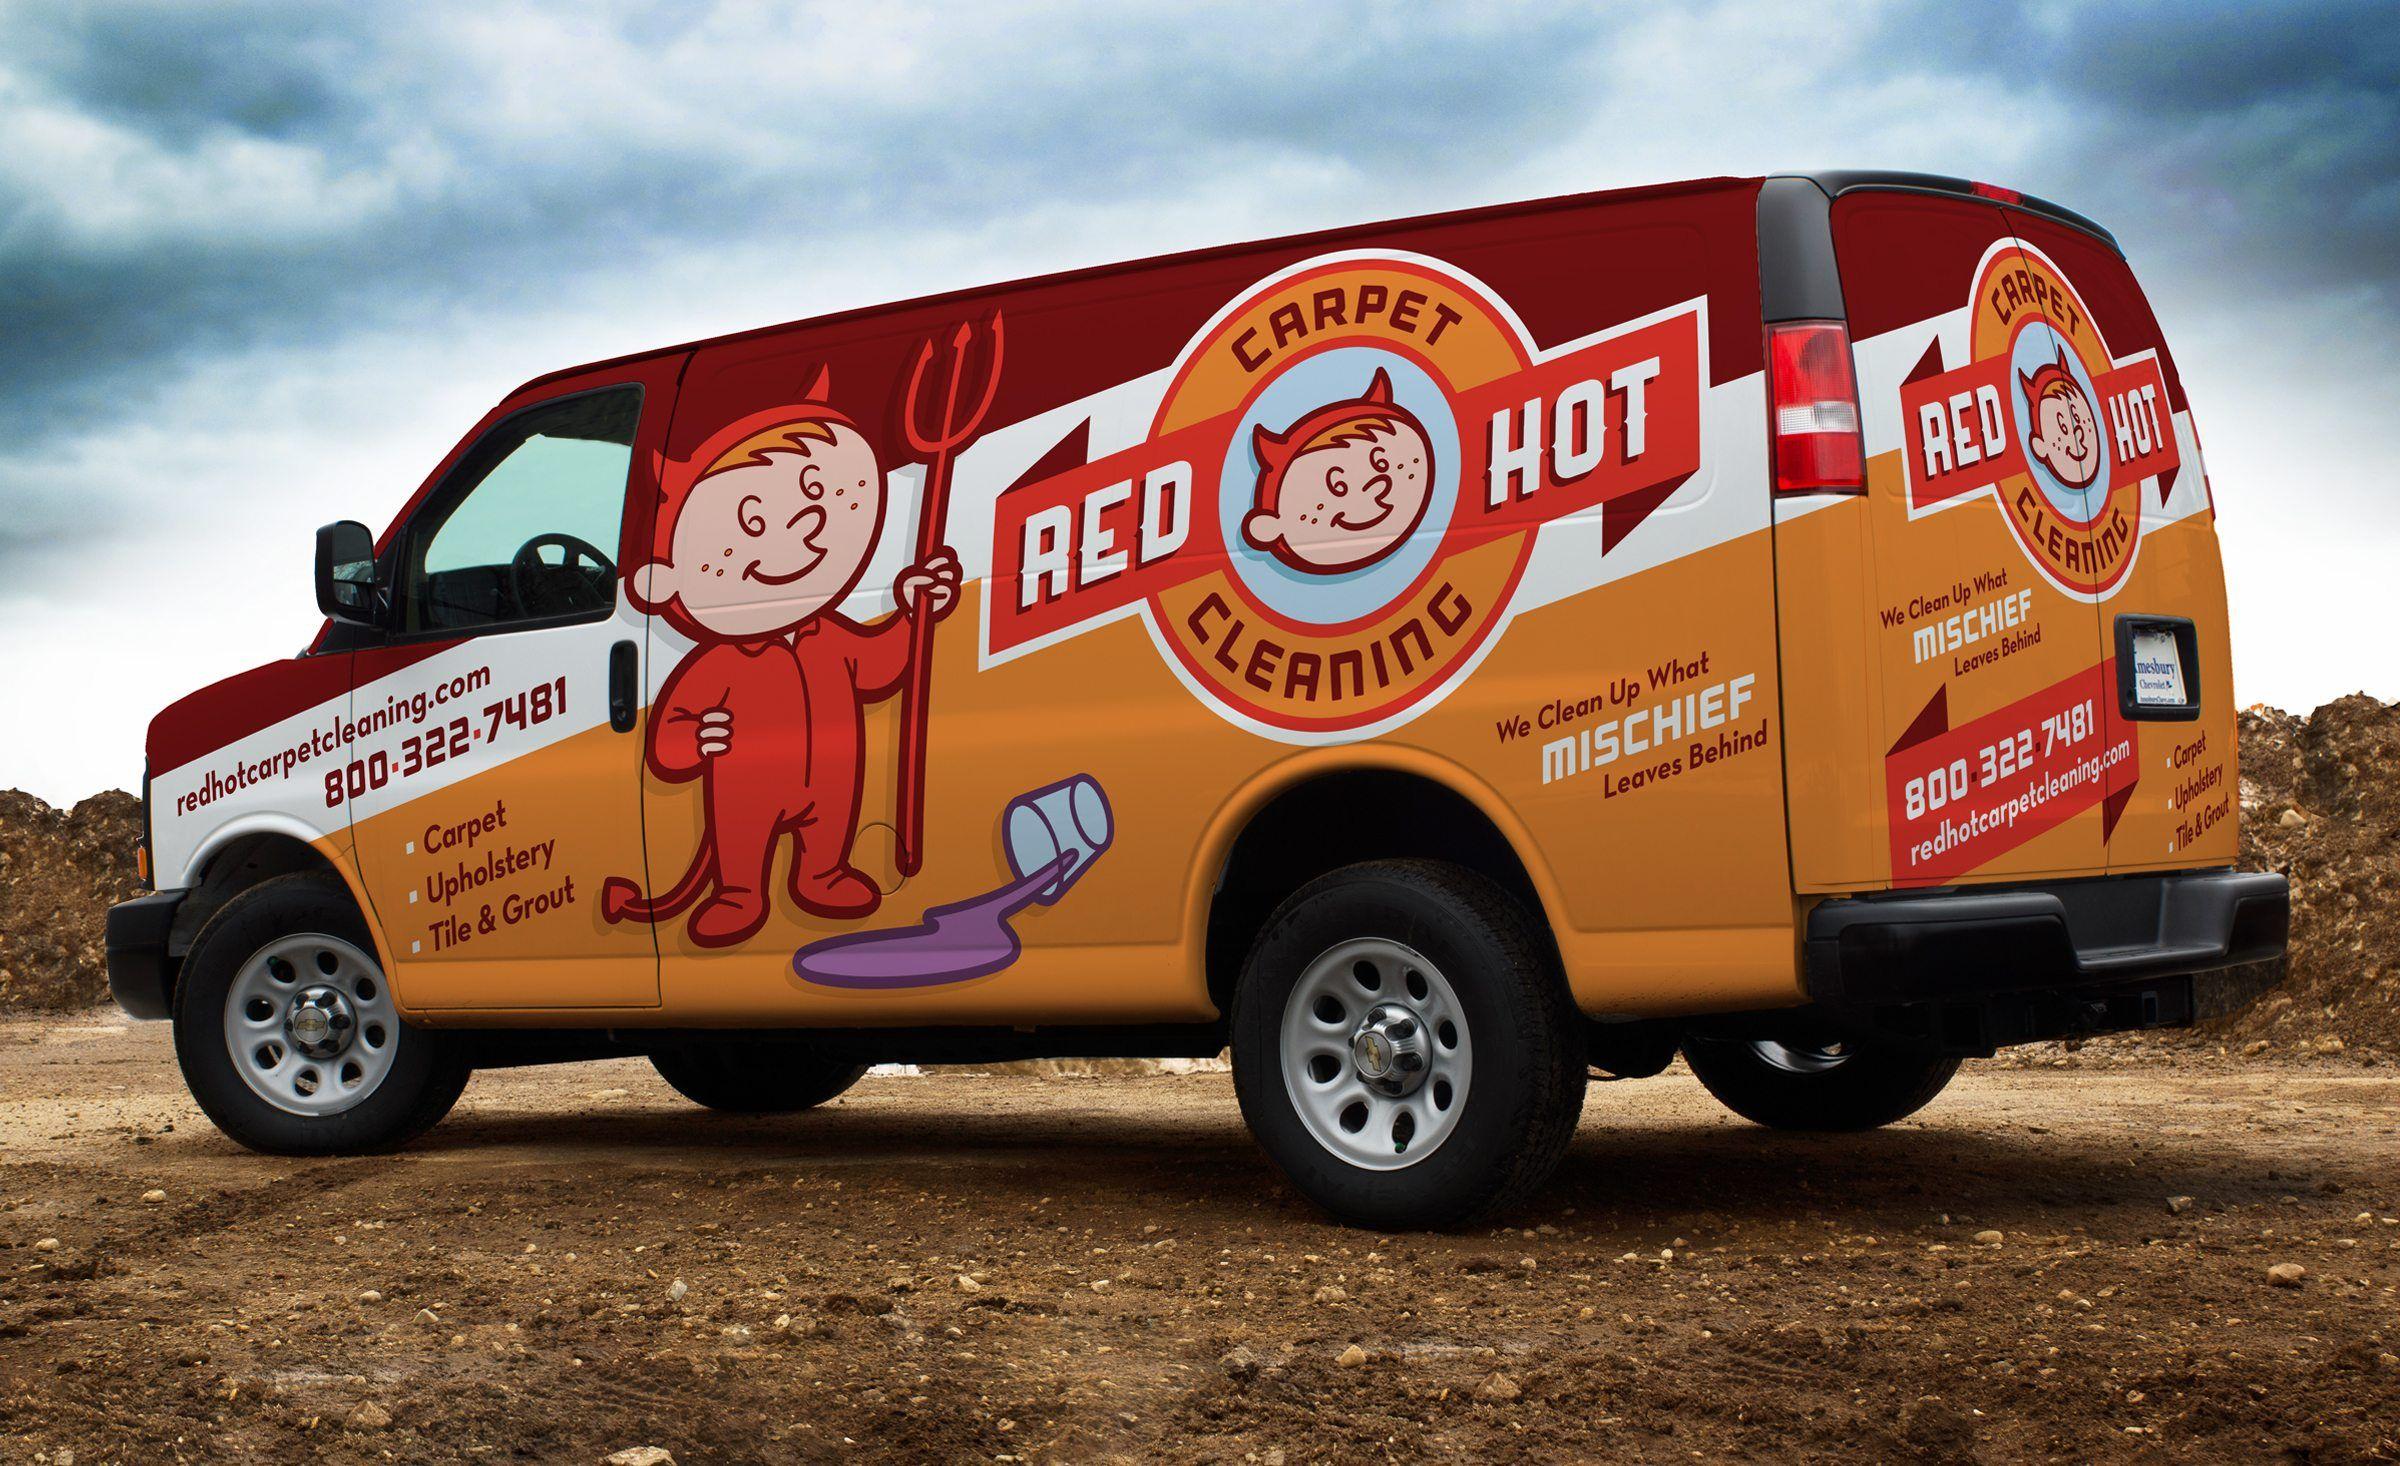 Our Best Truck Wraps Best Hvac Van Wraps Fleet Branding Nj Truck Wraps In 2020 Cool Trucks Car Wrap Car Wrap Design